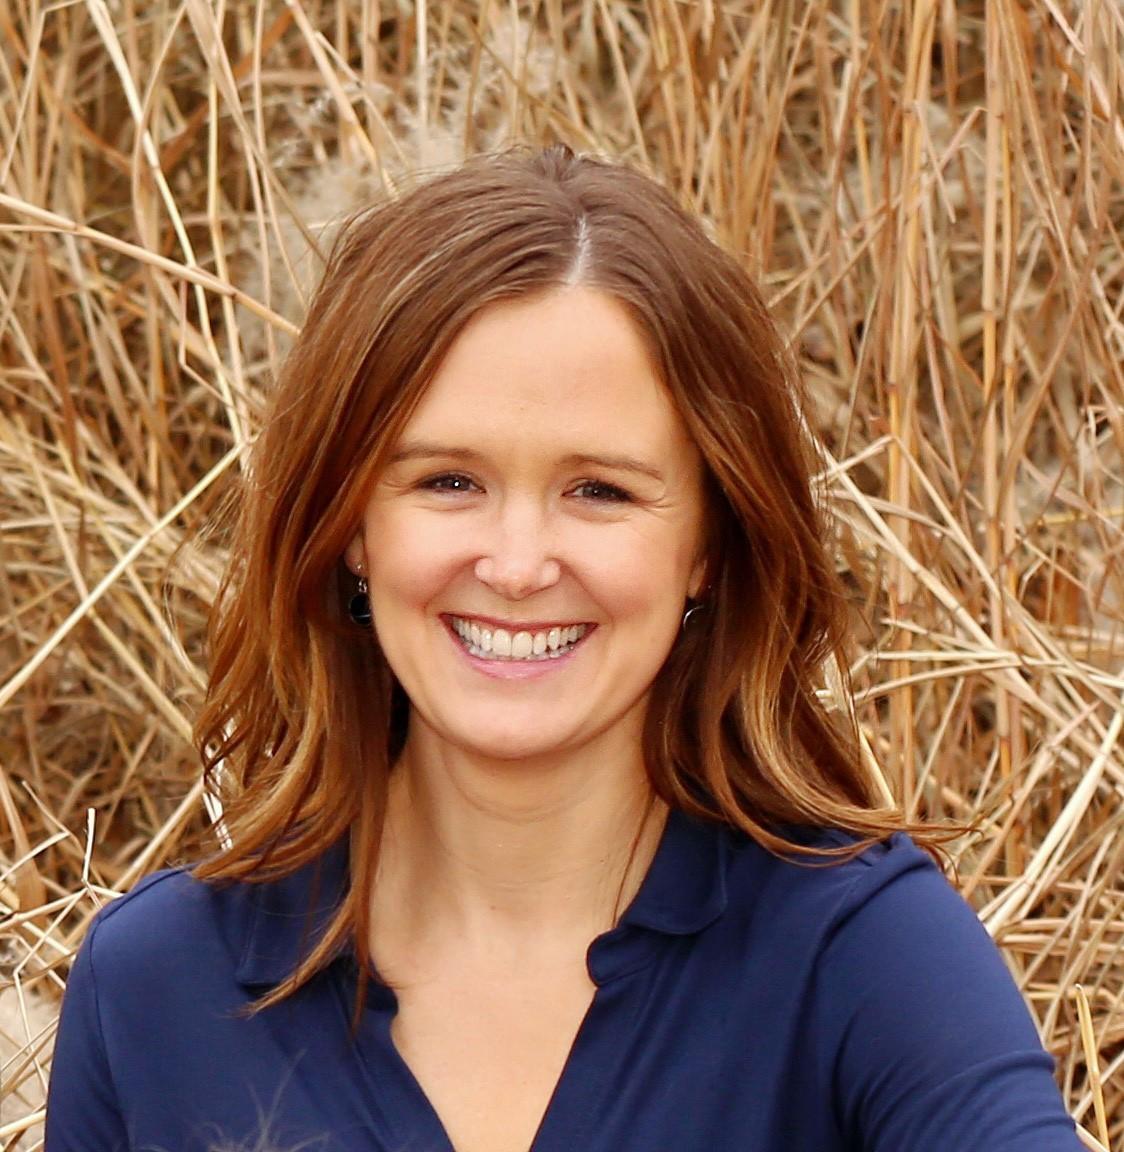 Dr. Brooke Solberg